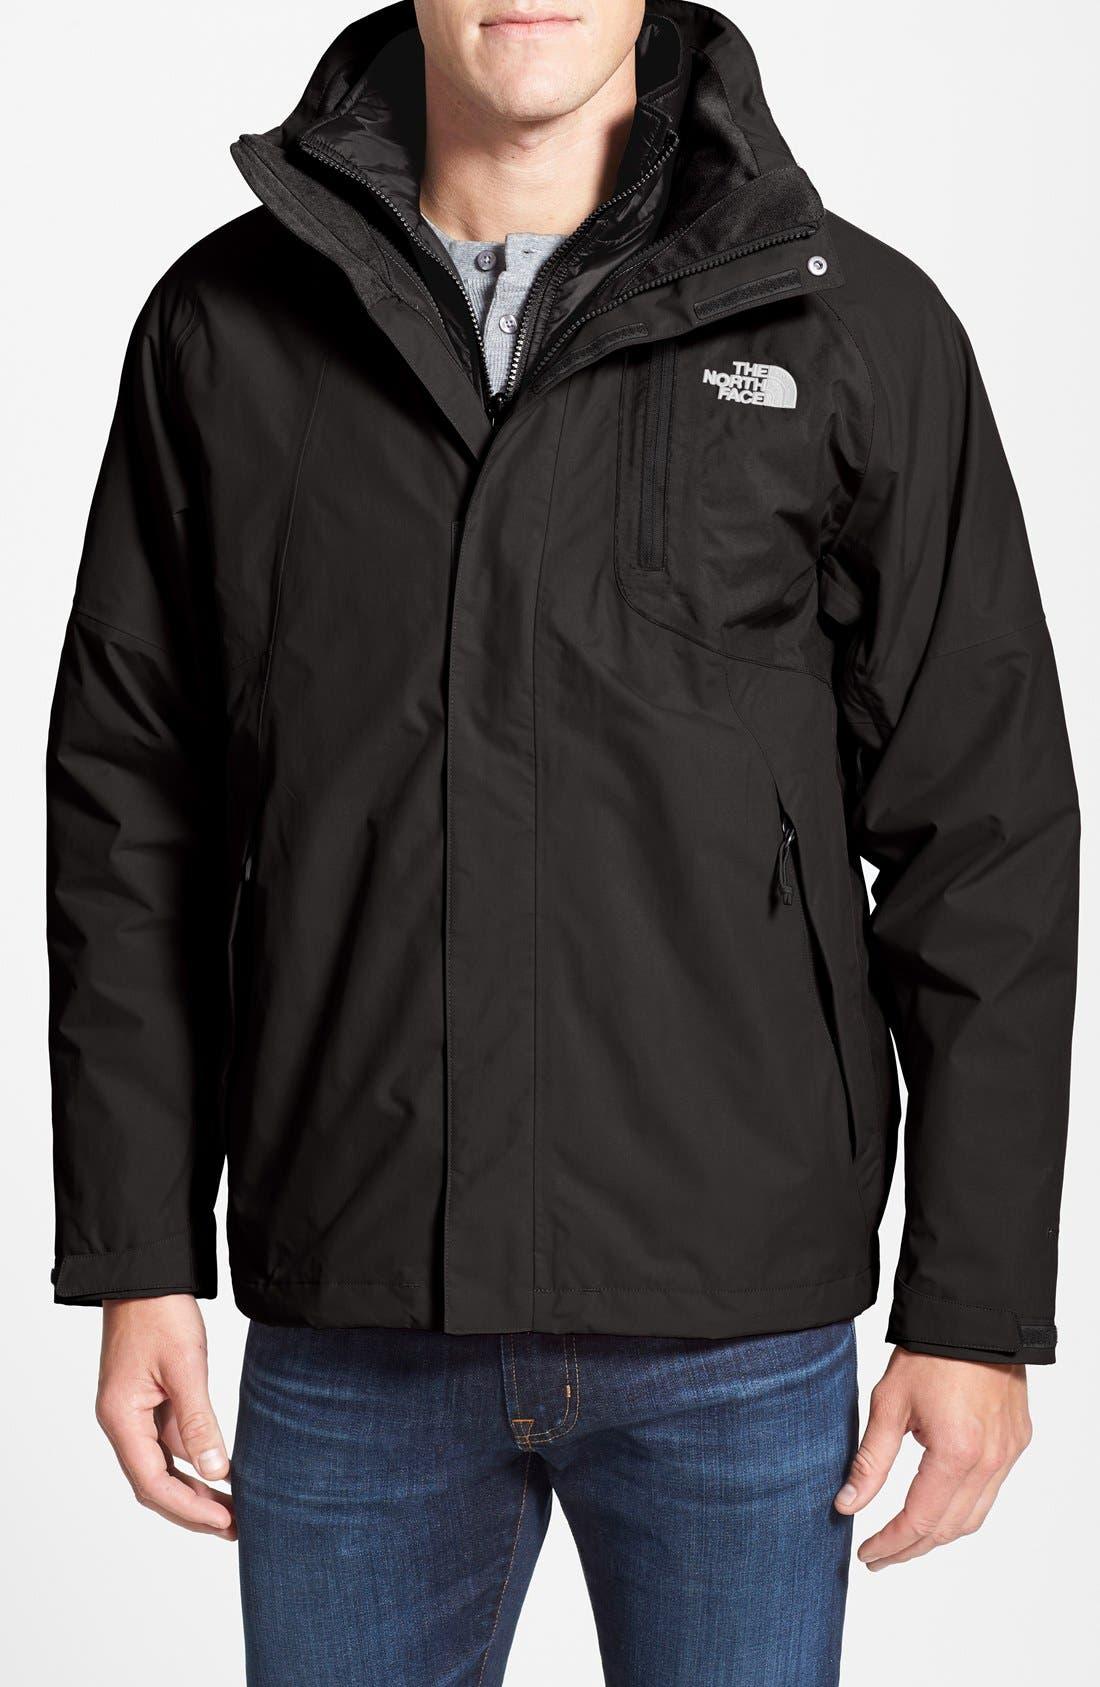 Carto triclimate jacket men's